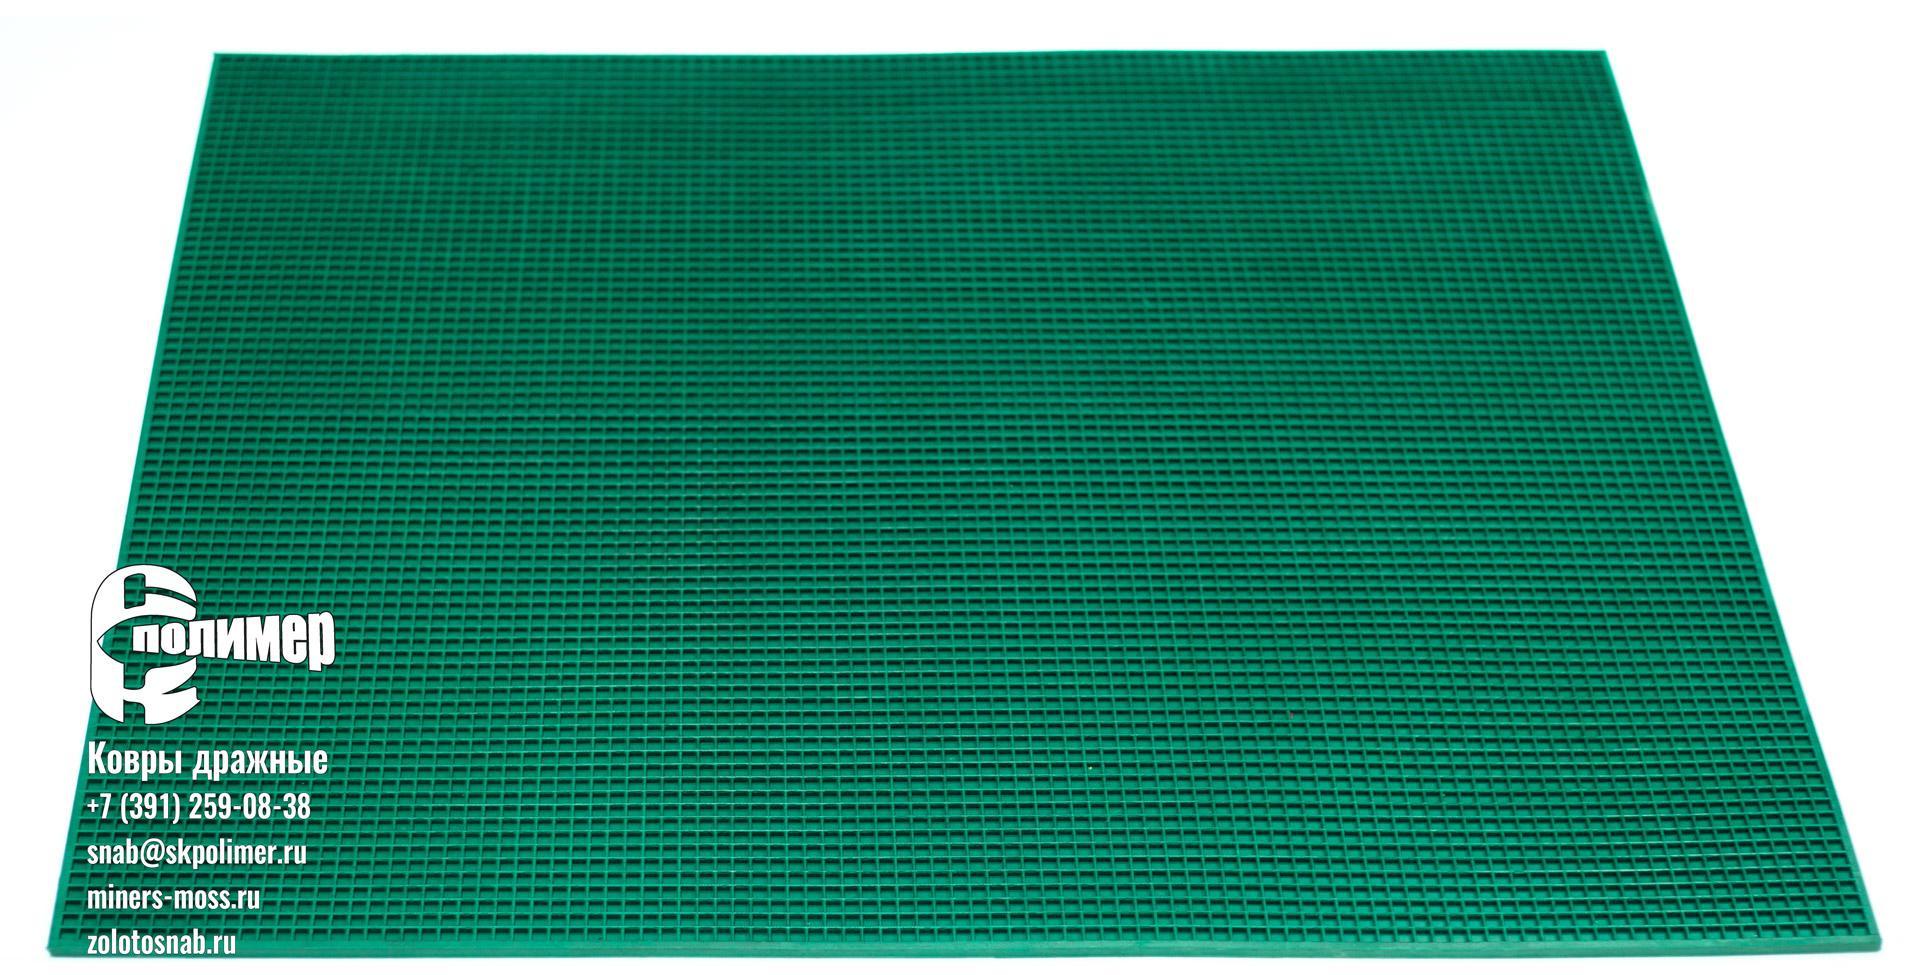 Ковер дражный зеленый 1000х800